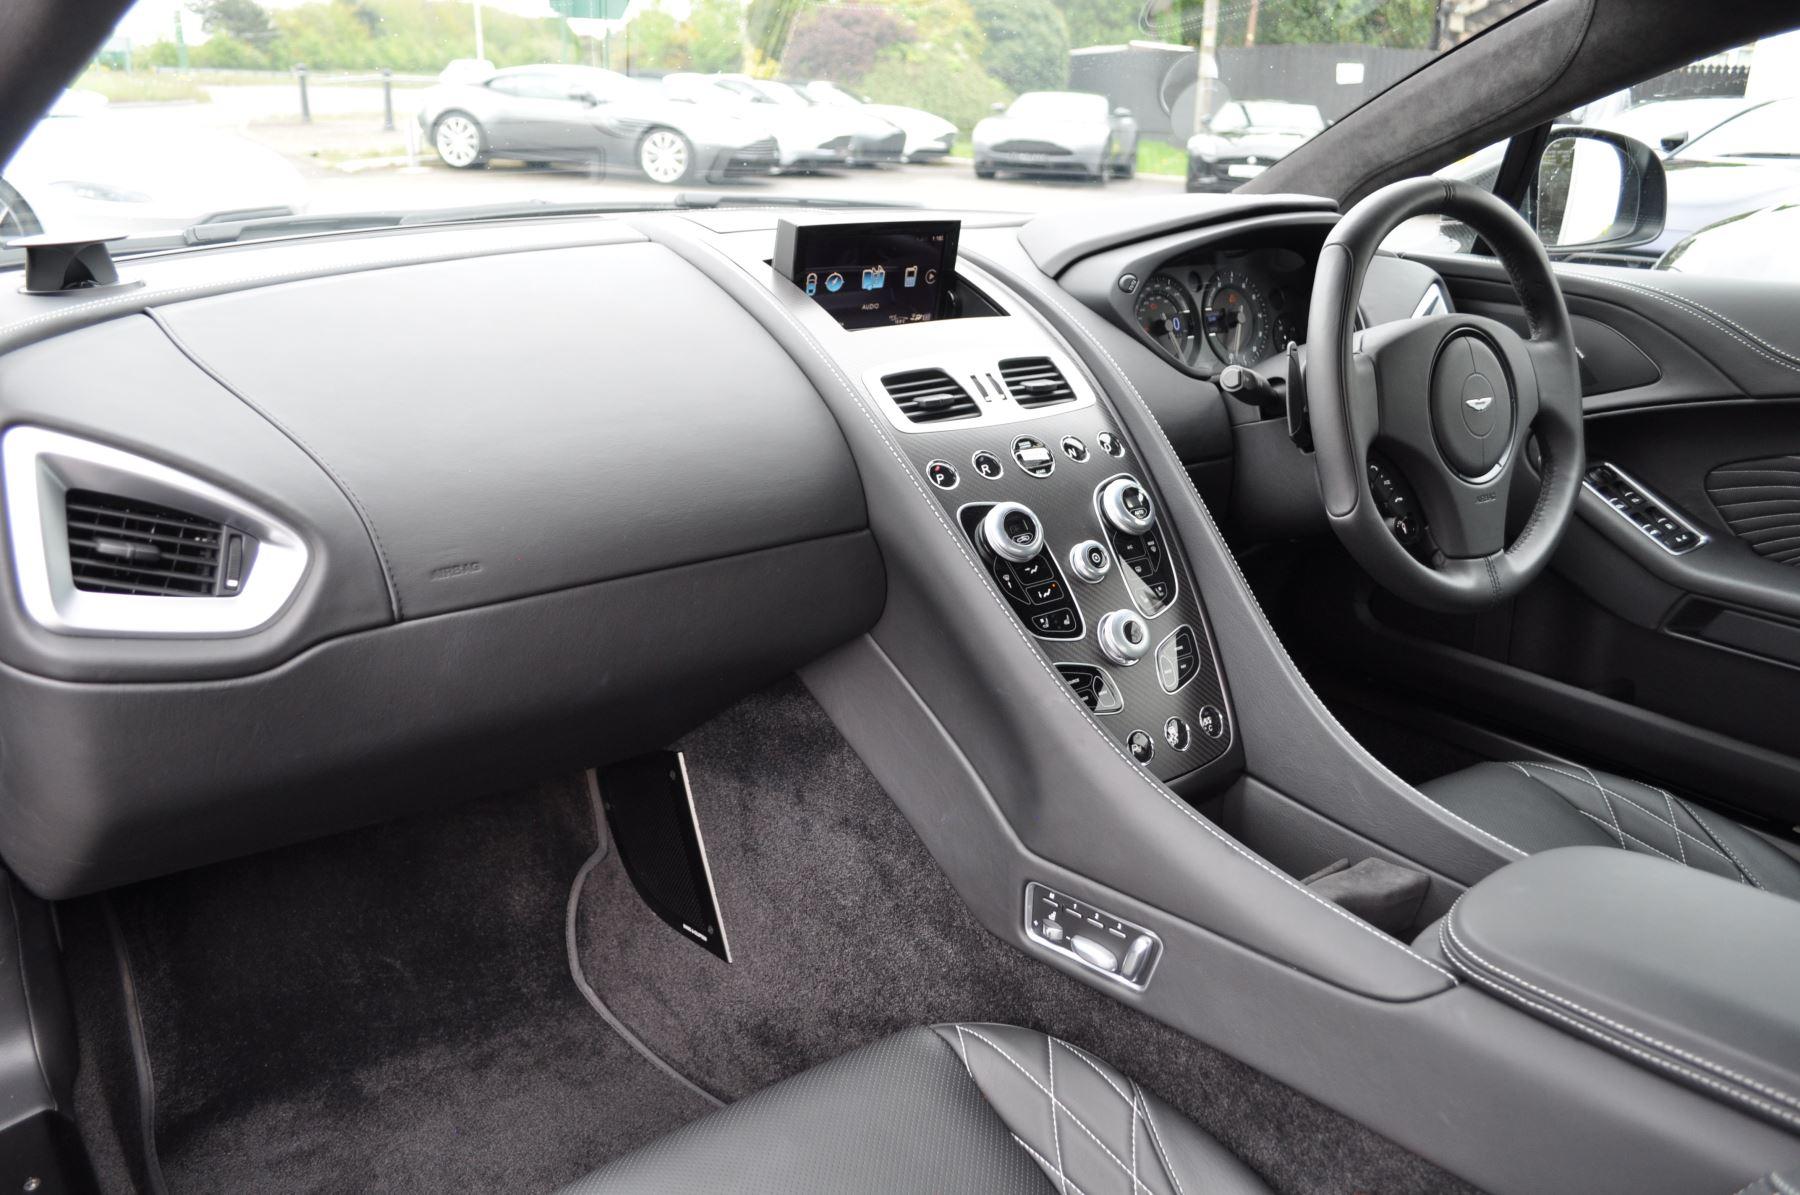 Aston Martin Vanquish S V12 [595] S 2+2 2dr Touchtronic image 31